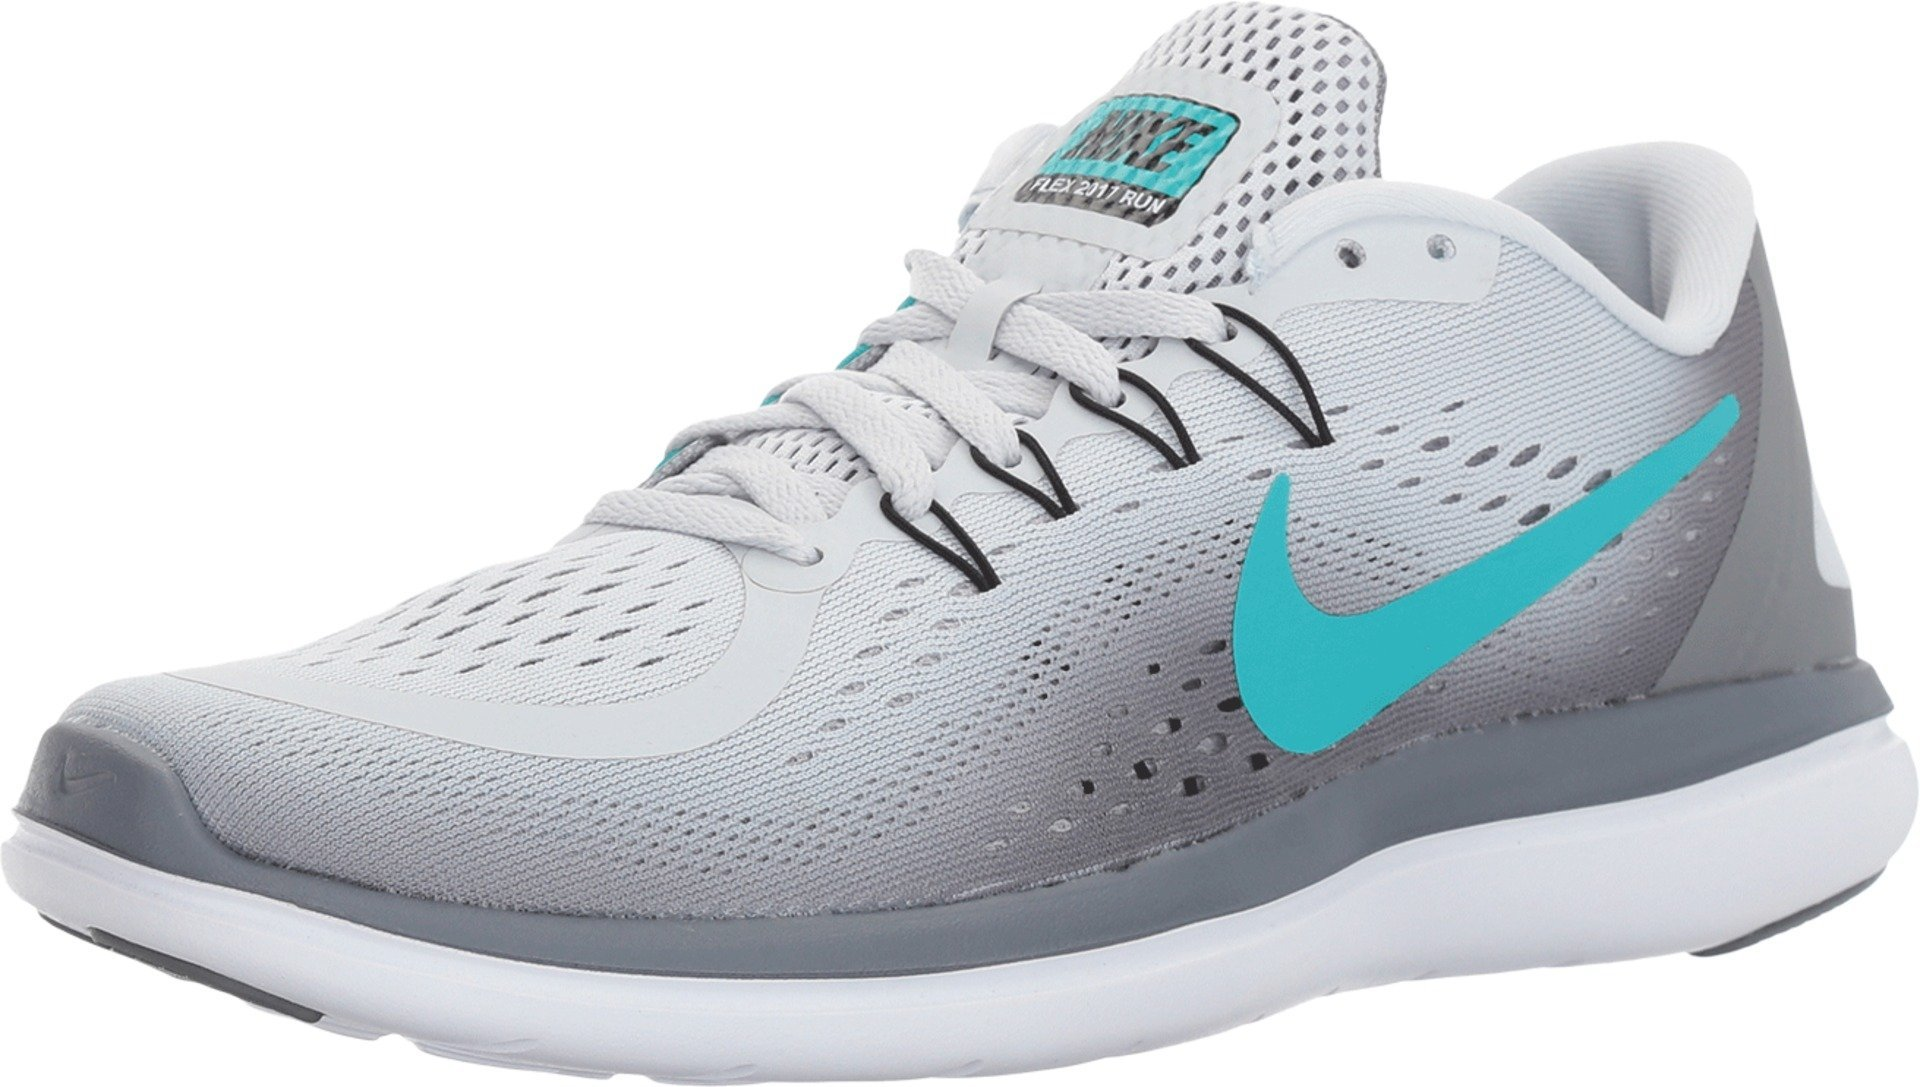 Nike Womens Flex 2017 Running Shoes Pure Platinum/Clear Jade-Grey Black 9